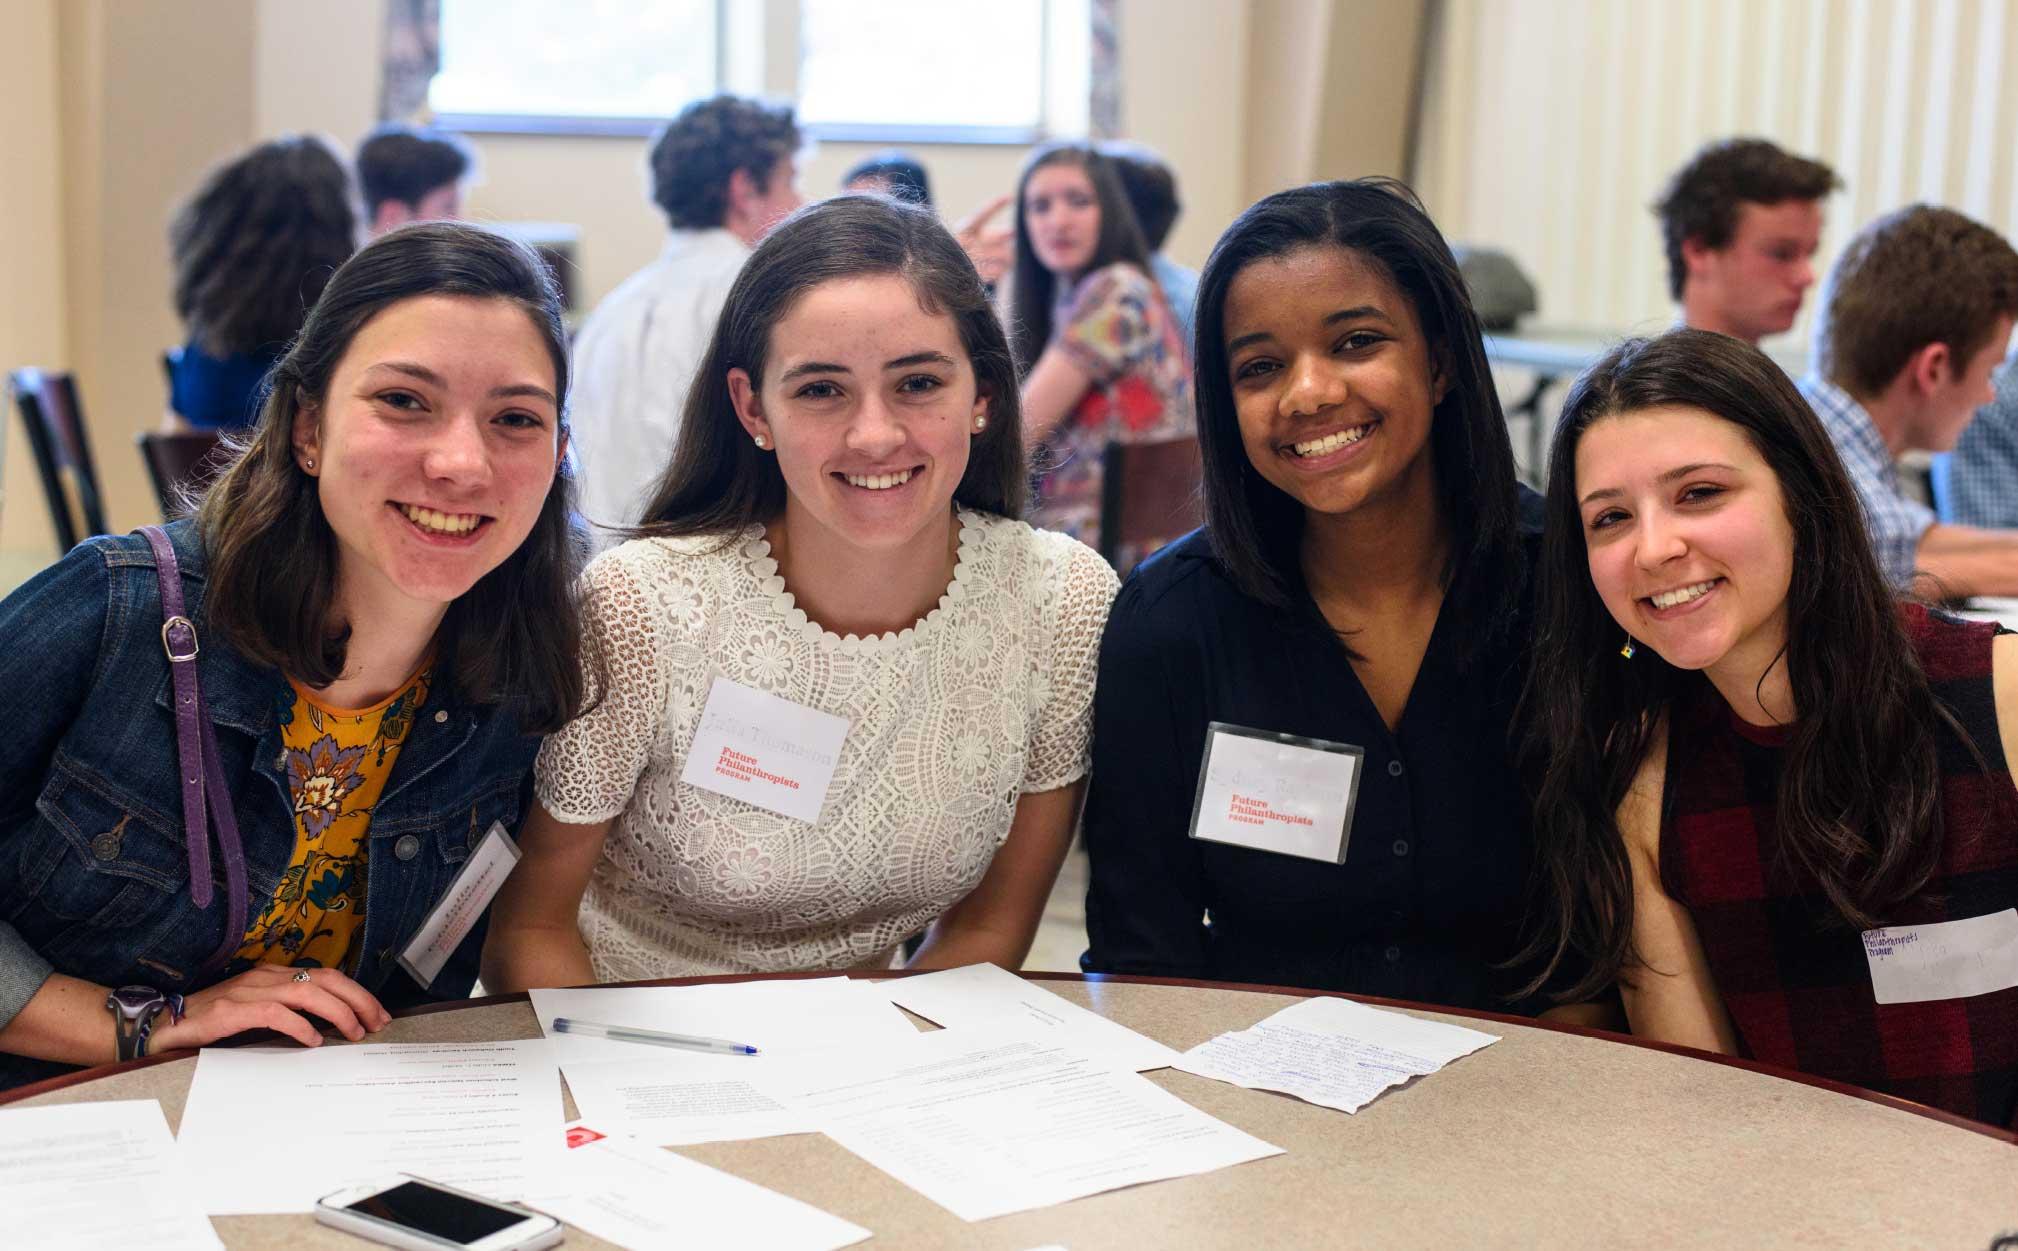 5-three-pillars-girls-at-table (1).jpg